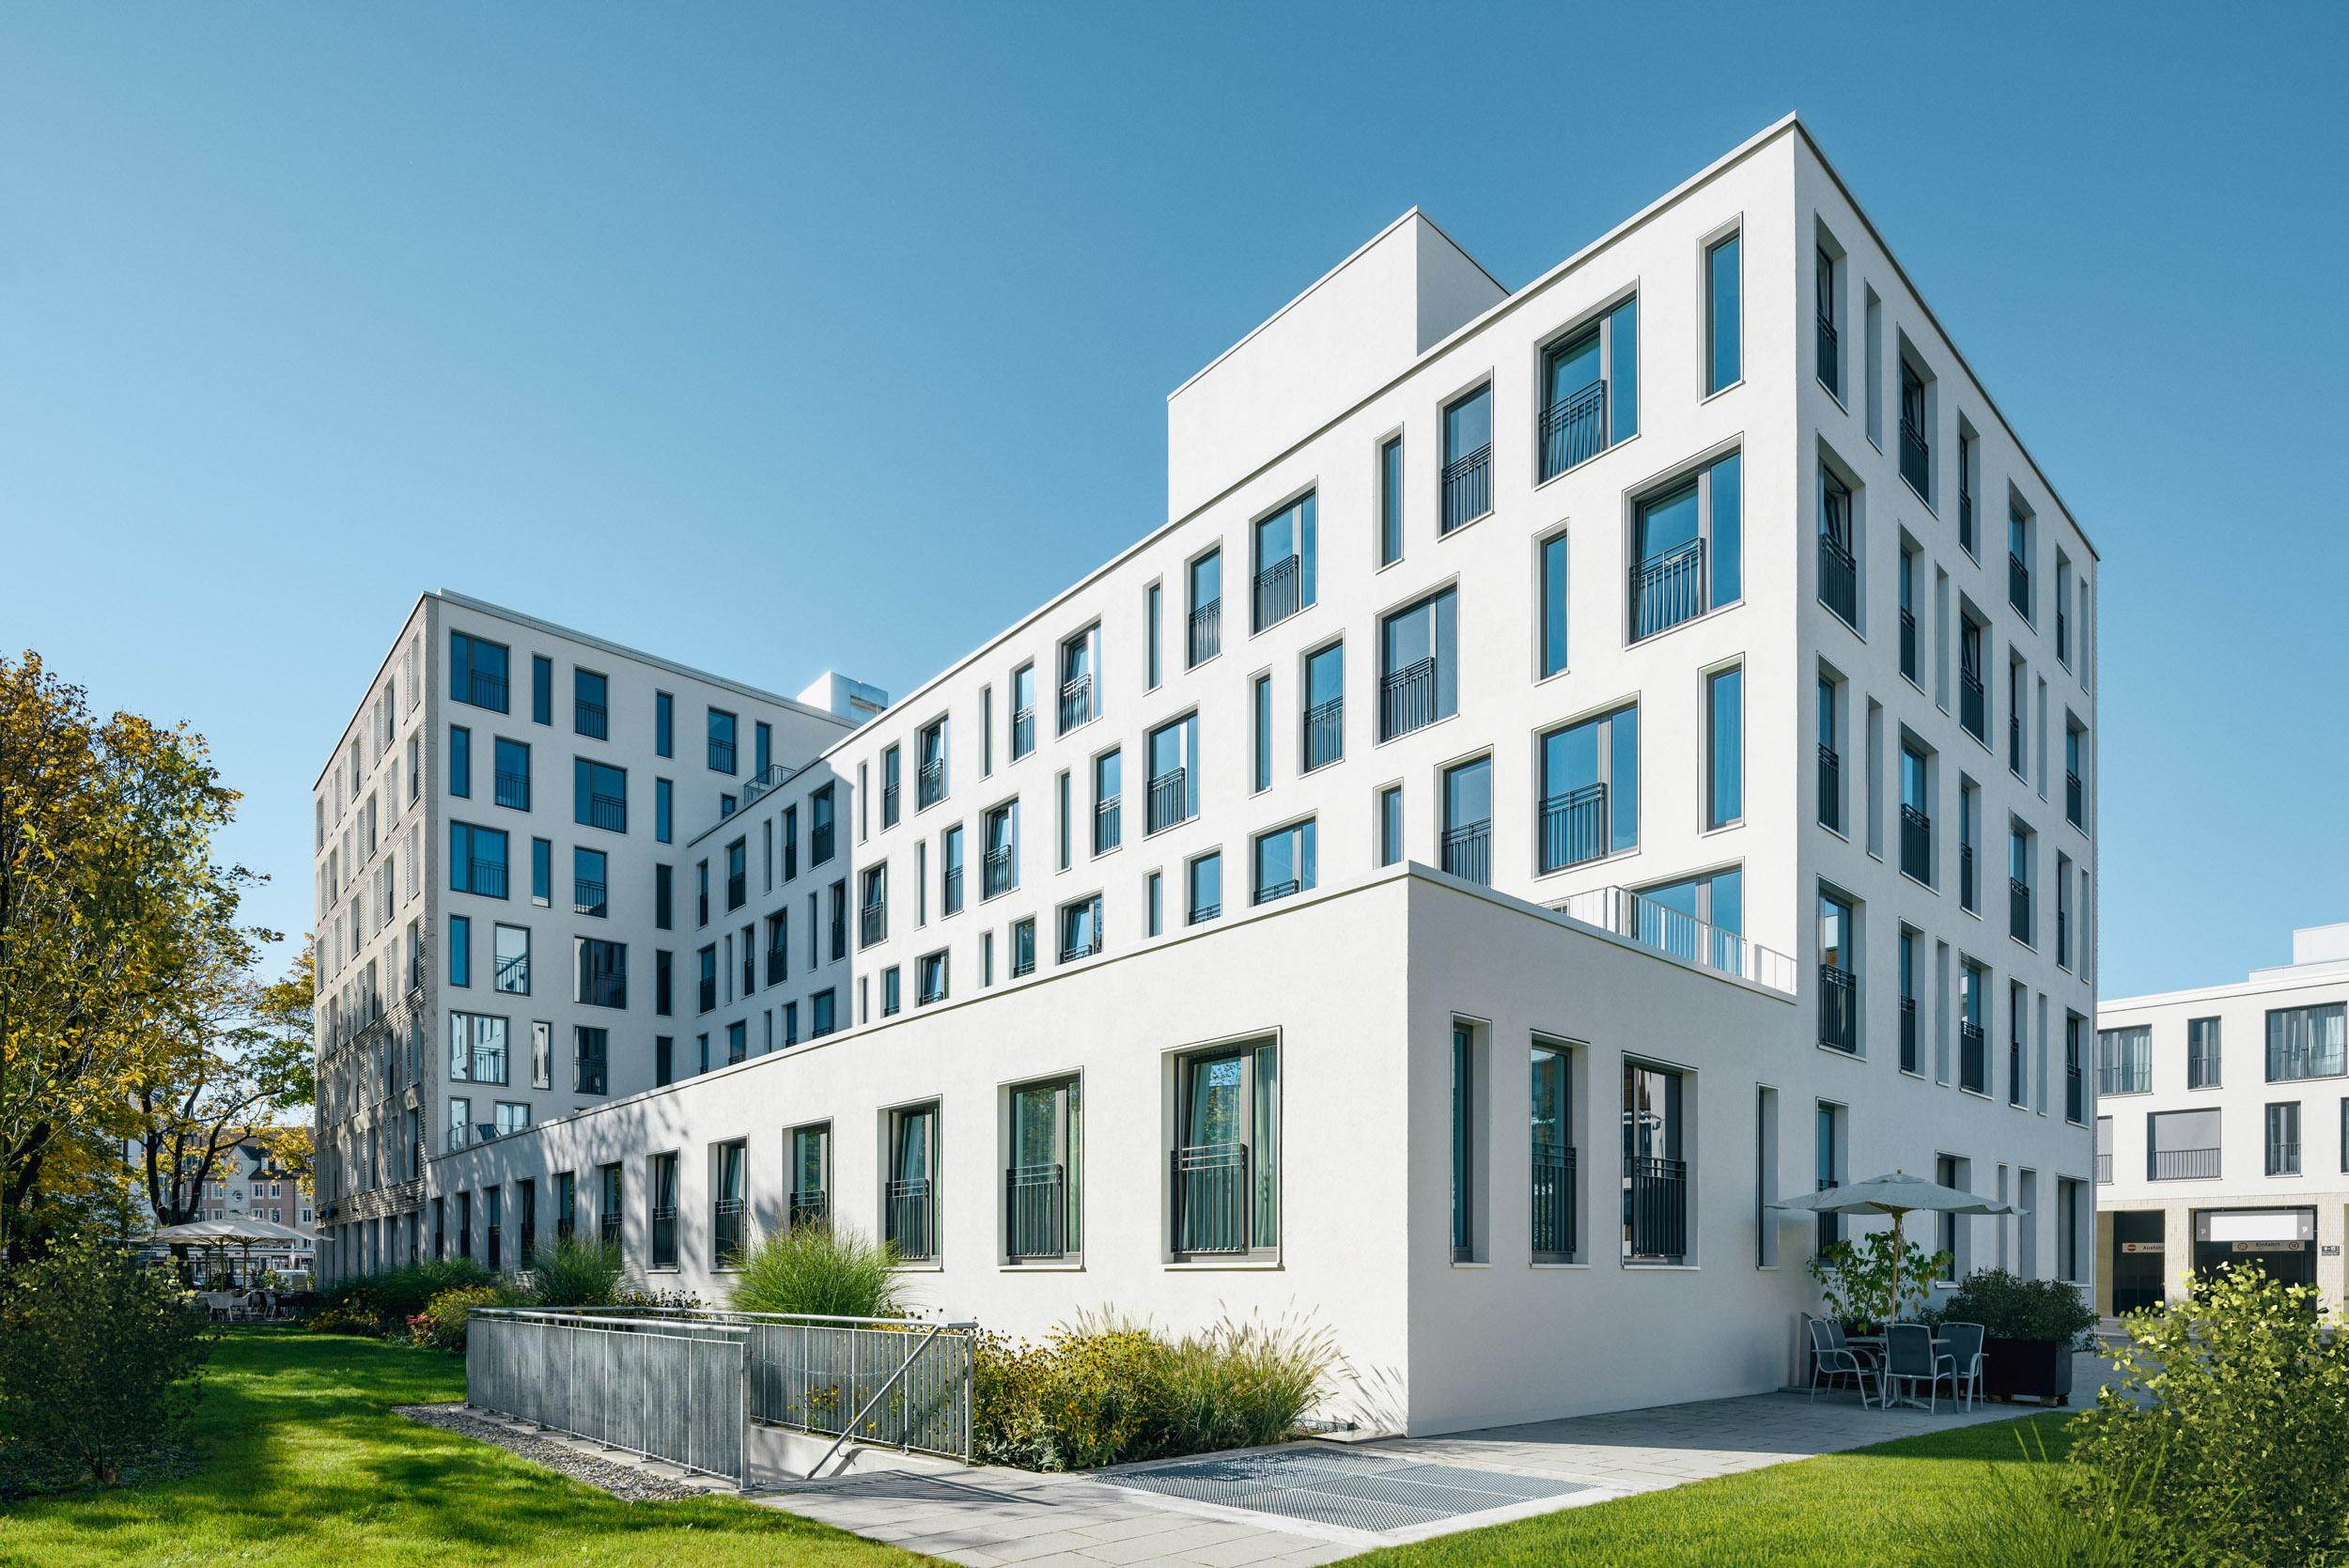 Gustav-Epple-Bauunternehmung-Motel-One-München-Olympiagate-MLX8607